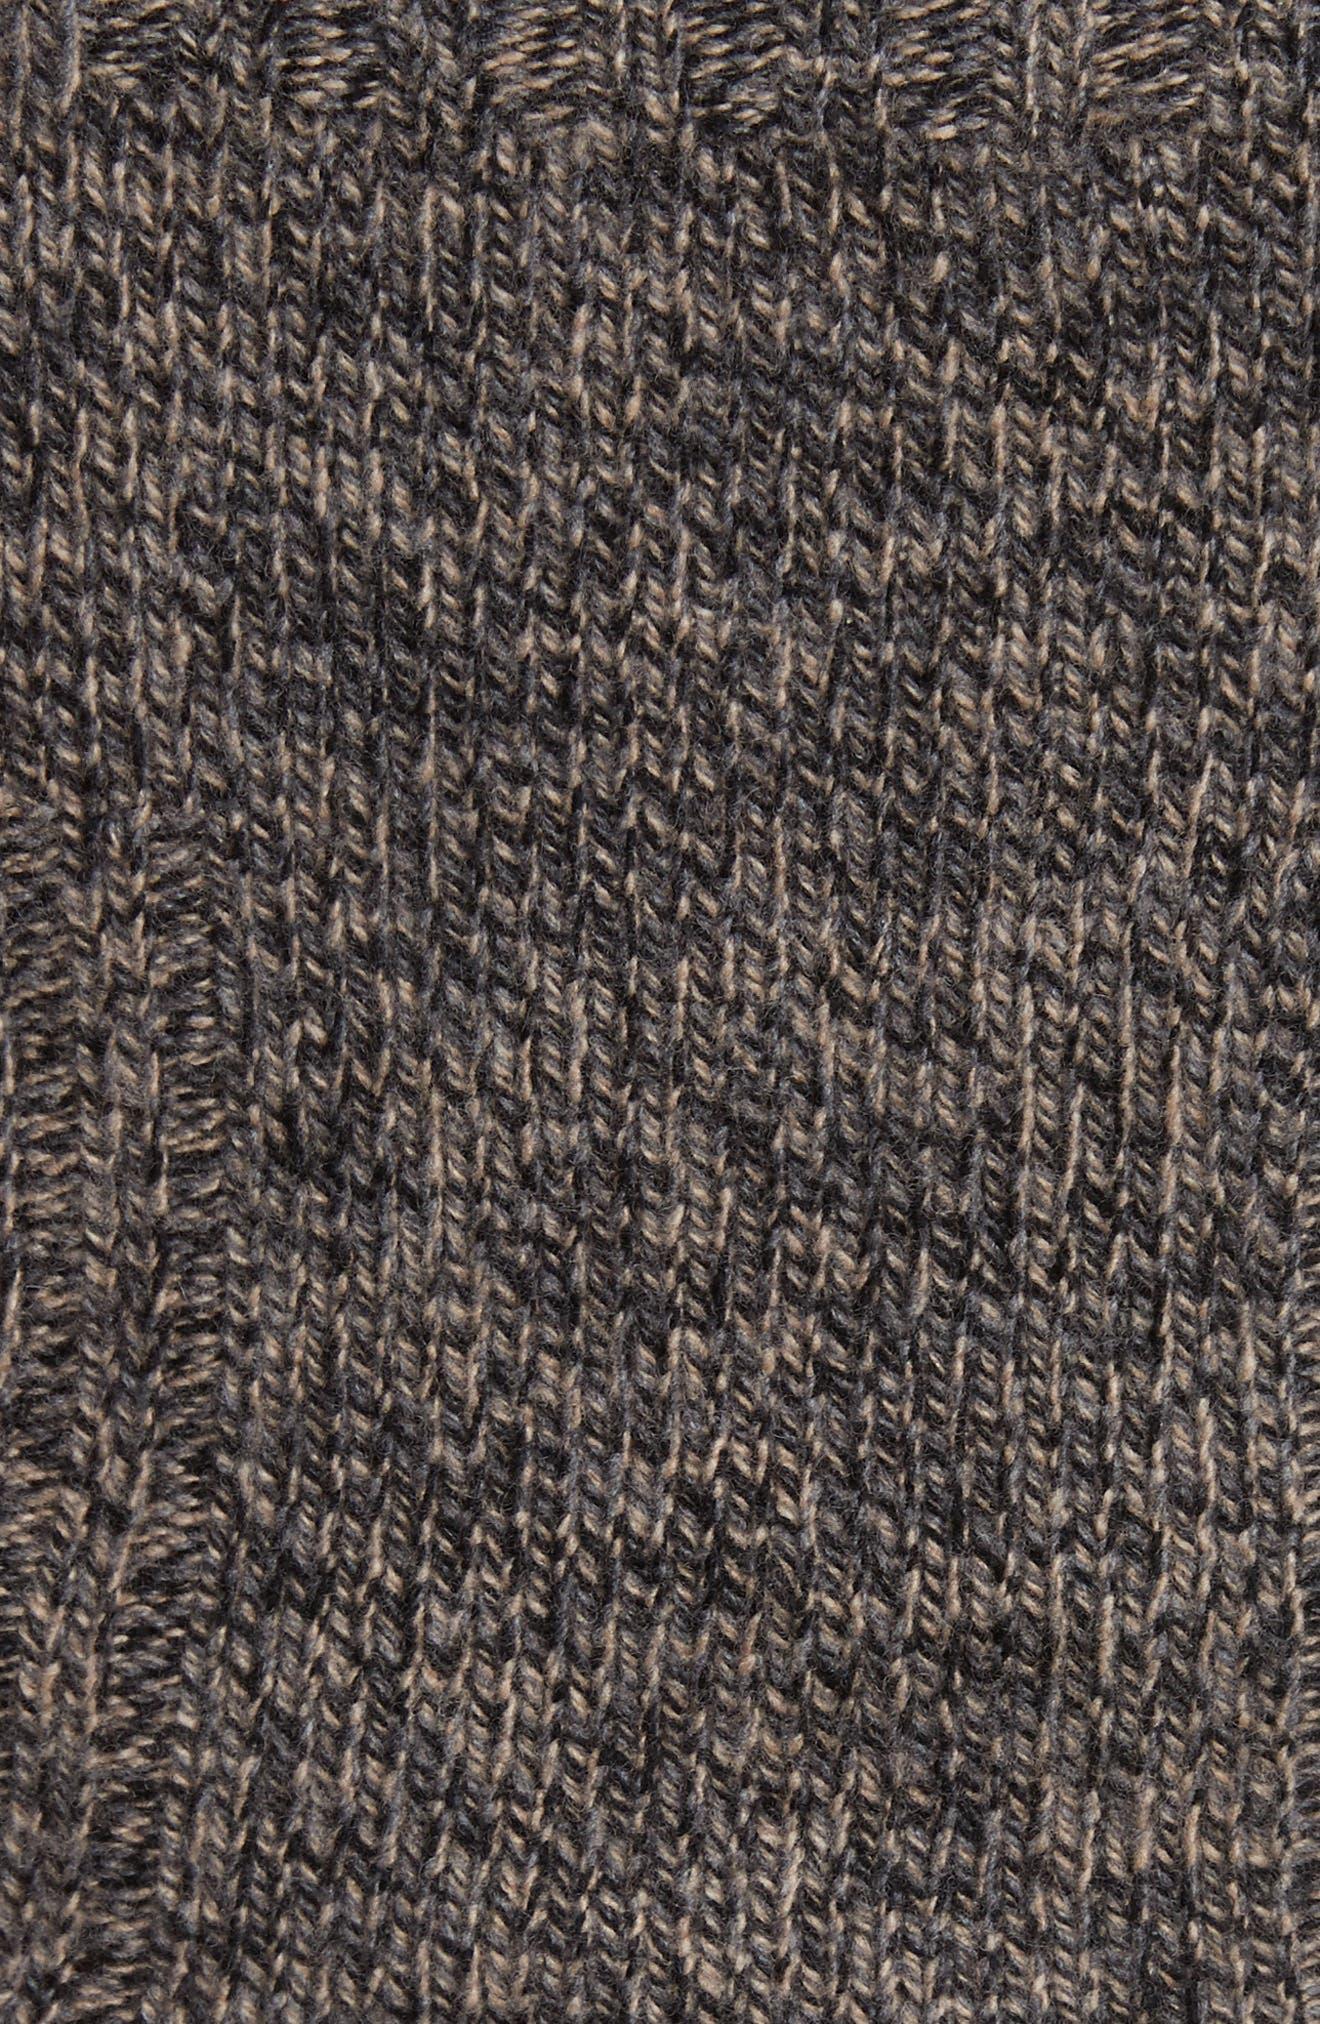 Mouline Wool Blend Sweater Tank,                             Alternate thumbnail 5, color,                             003